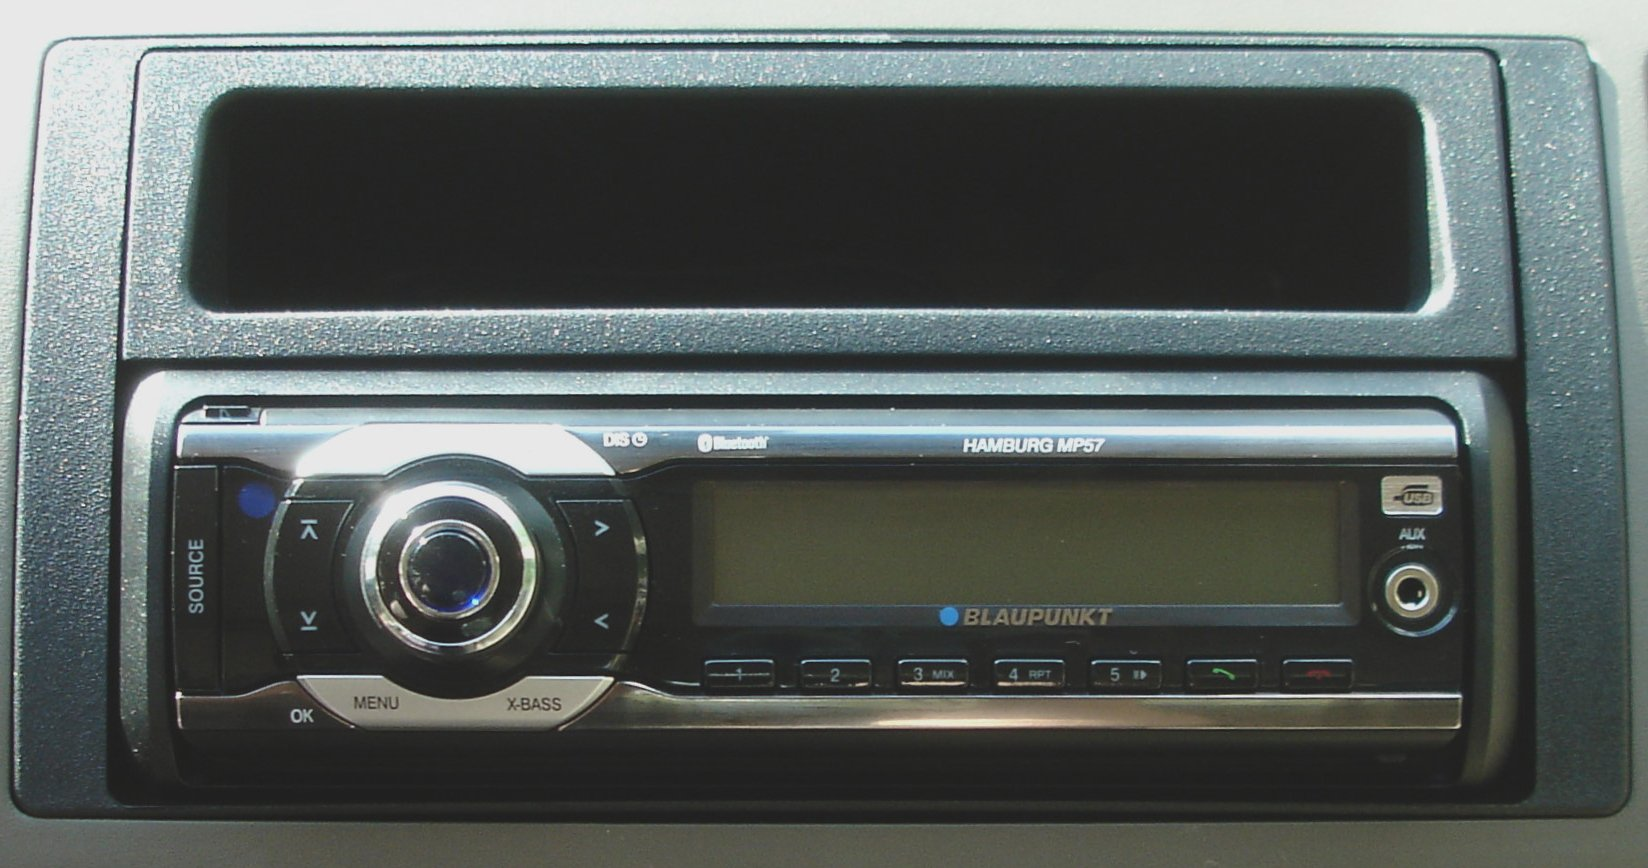 Watch besides Mazda 3 Pioneer Dvd Ipod Radio Aftermarket Dash Kit further M207 Peugeot 207 Media Satnav 2007 14 in addition 197 as well Jeep Wrangler Oem Fit Backup Camera System For Factory Display Radios. on aftermarket navigation radio